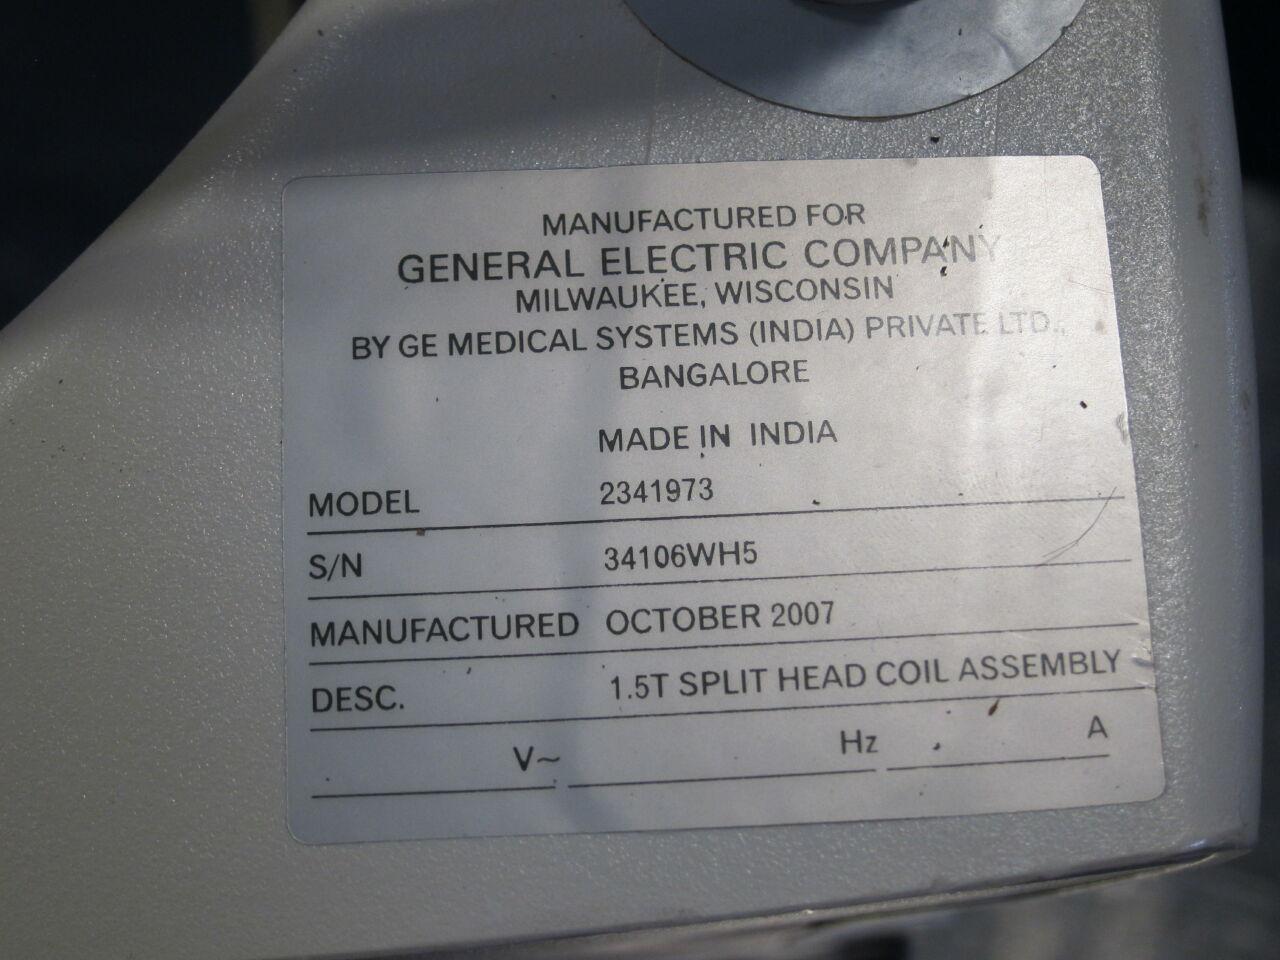 GE Signa 1.5 T Split Head MRI Coil